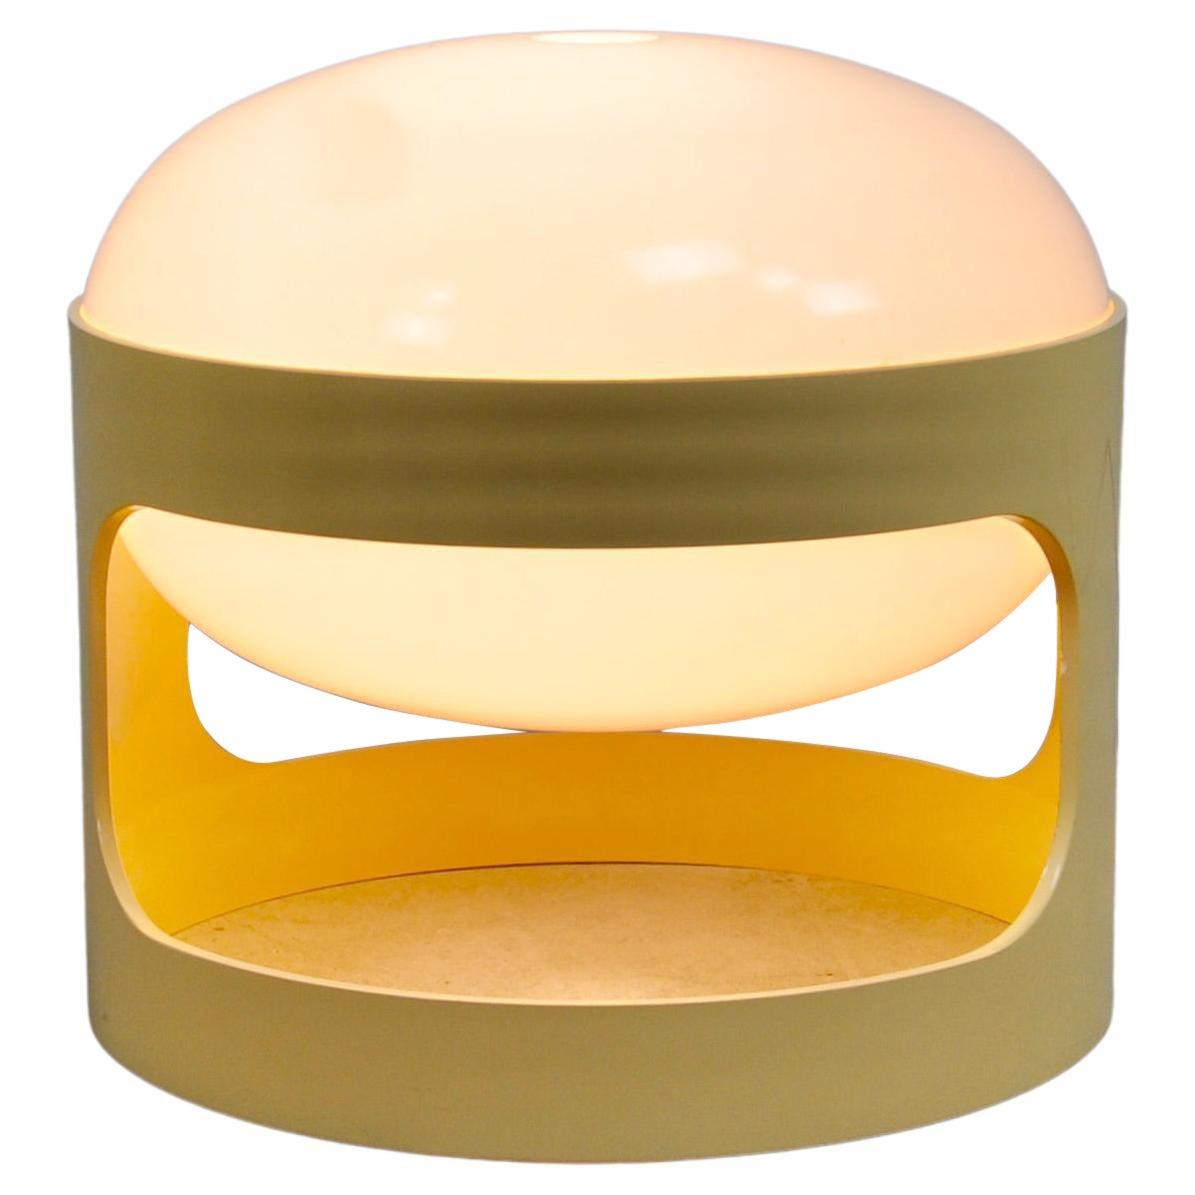 KD27 Table Lamp by Joe Colombo for Kartell, 1967